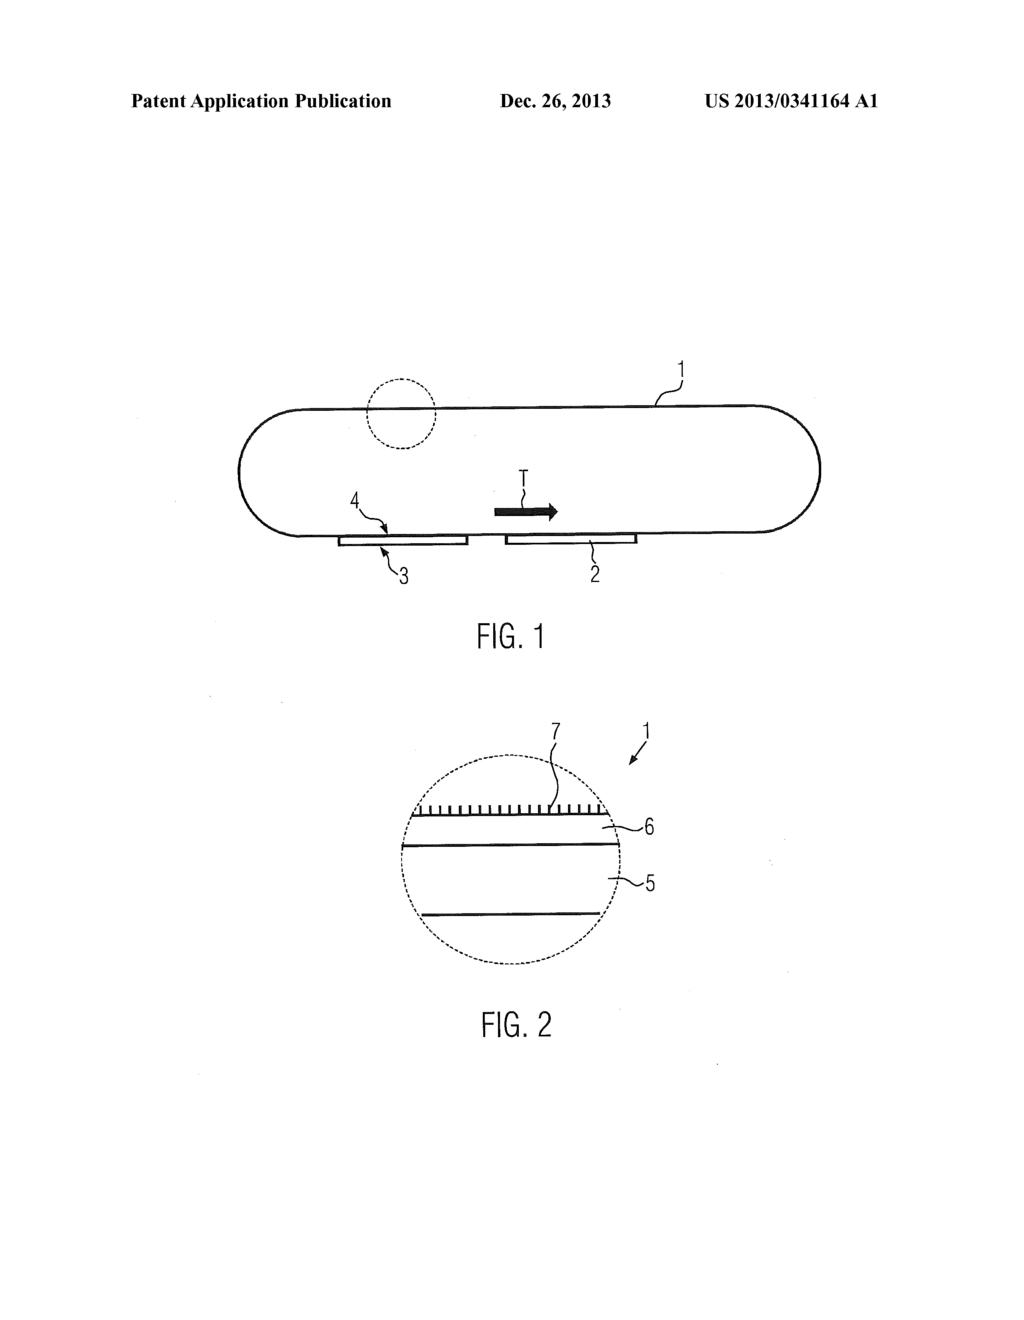 2 Conveyor Motor Schematic Drawing Block Wiring Diagram Explanation Belt Label Portal Types Of Belts Industrial Electrical